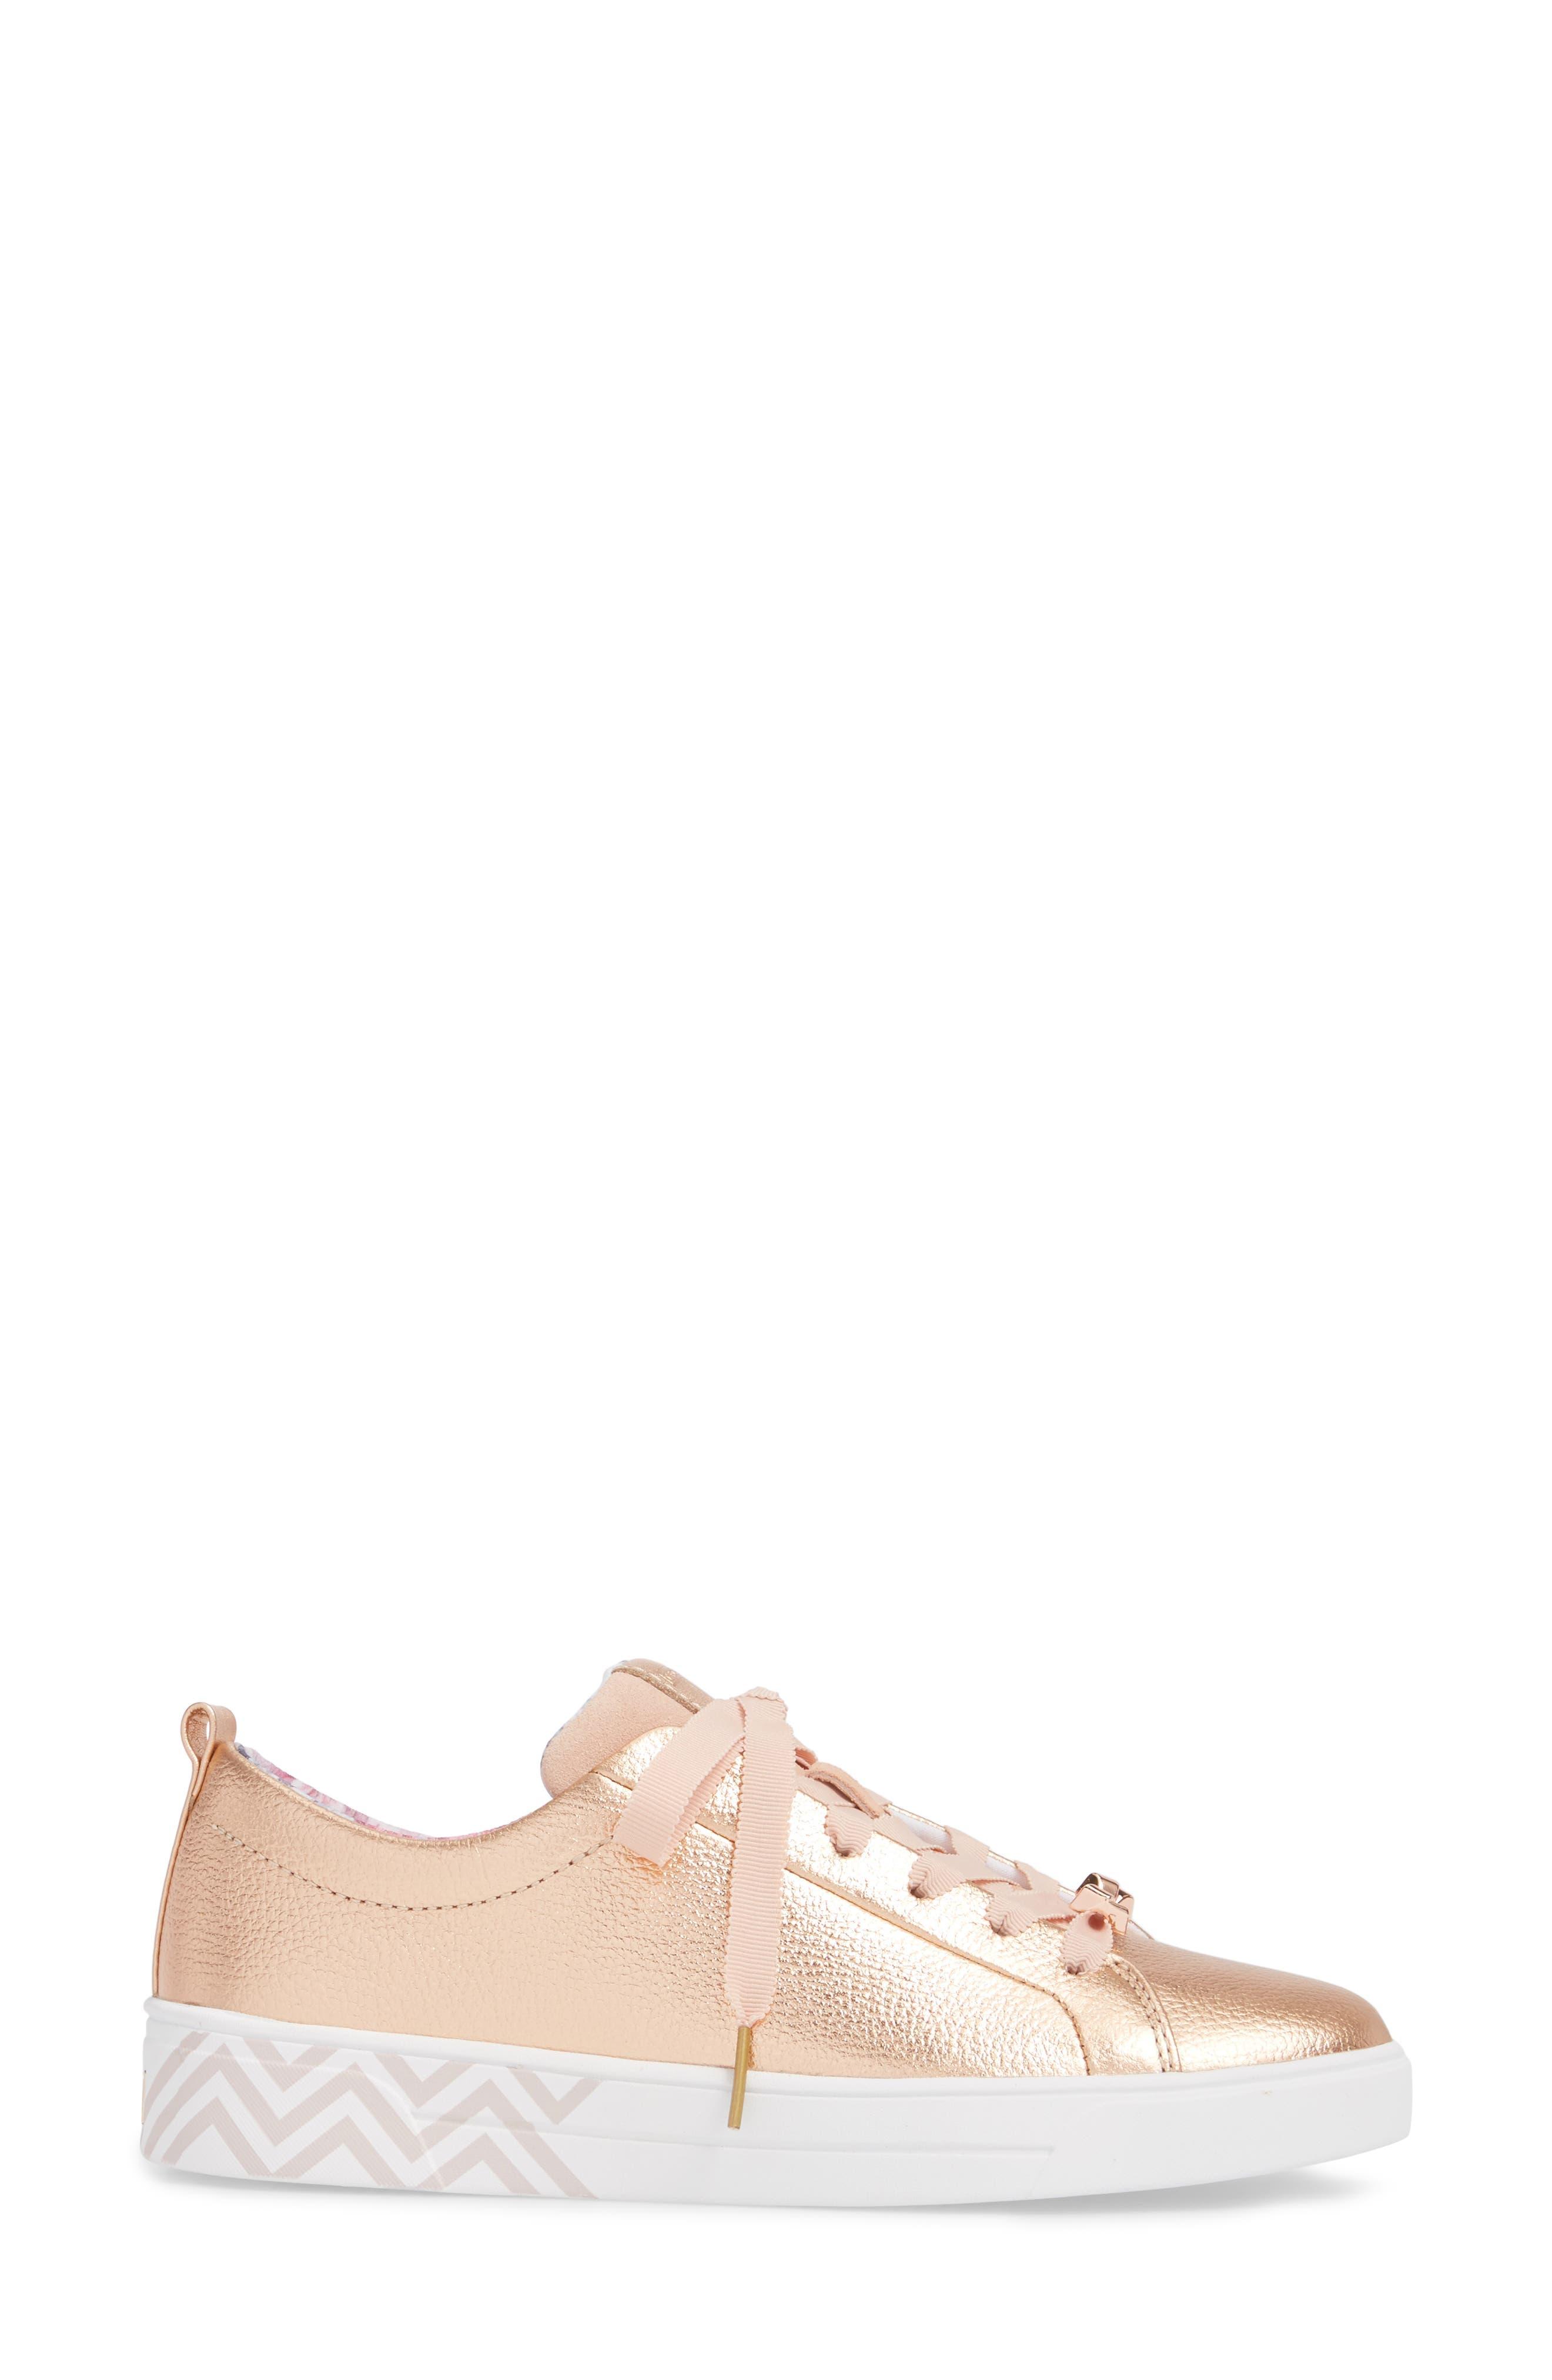 Kelleip Sneaker,                             Alternate thumbnail 3, color,                             ROSE GOLD/ PALACE GARDENS